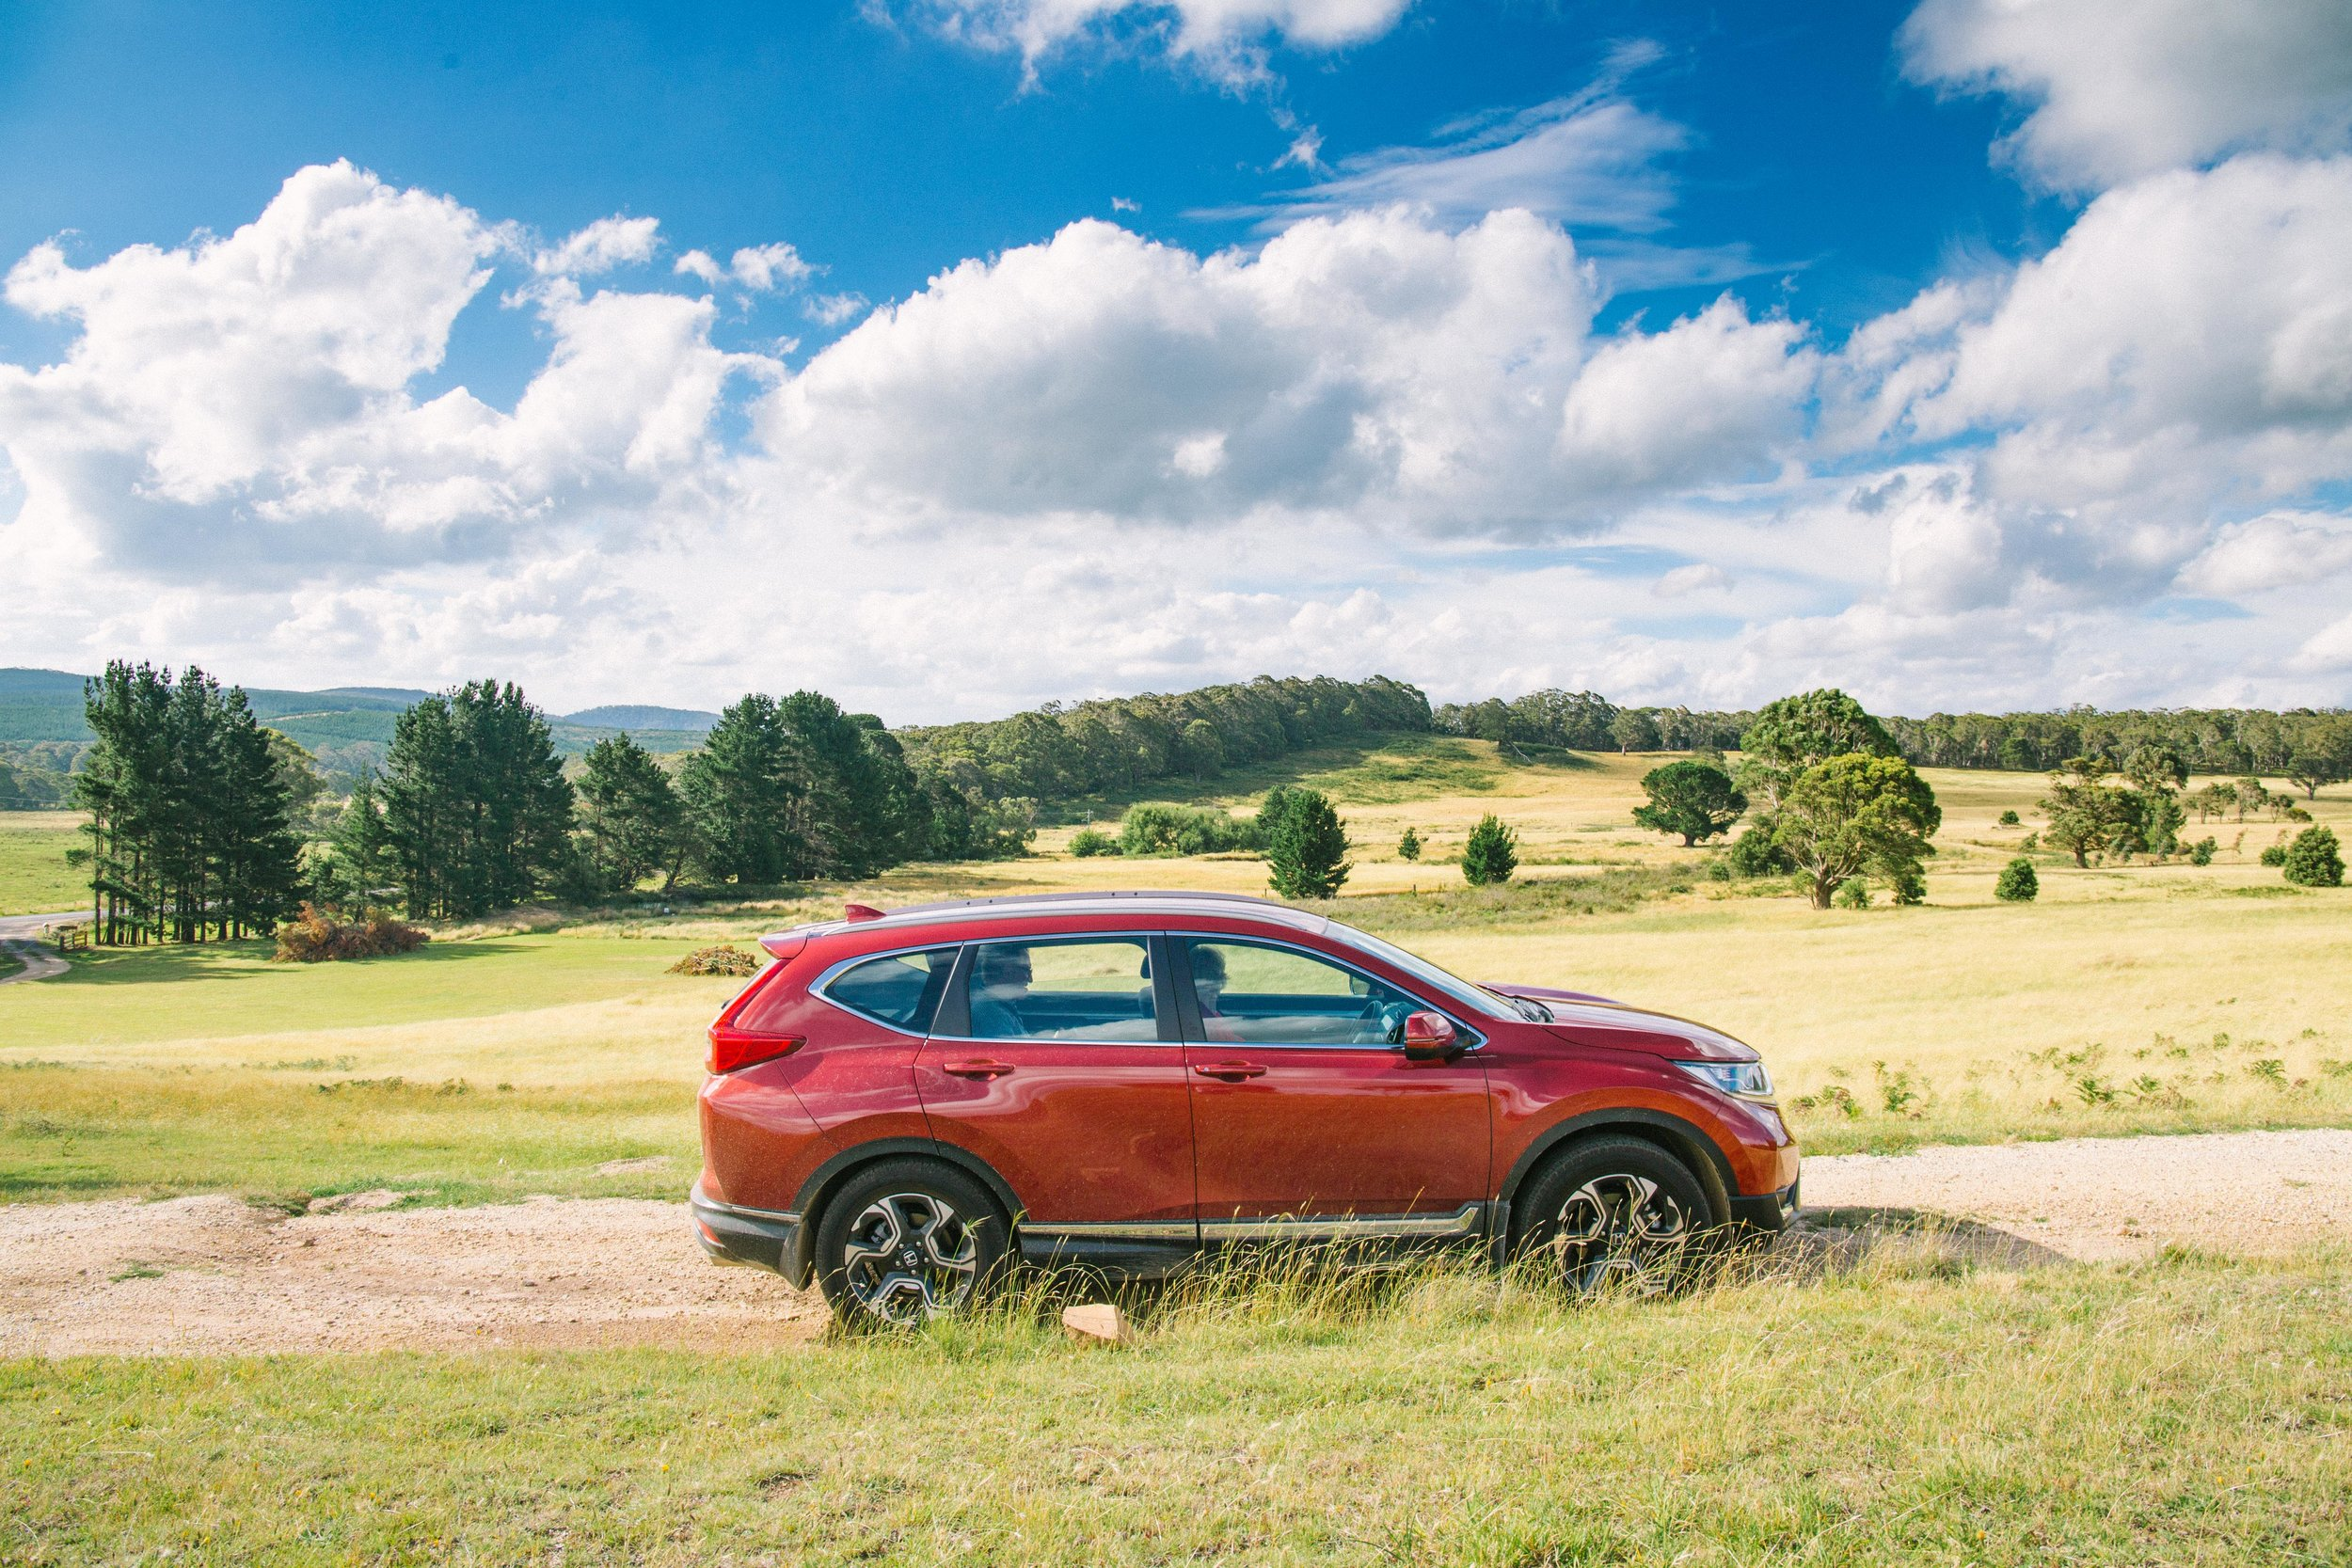 Honda Australia - Automotive photography